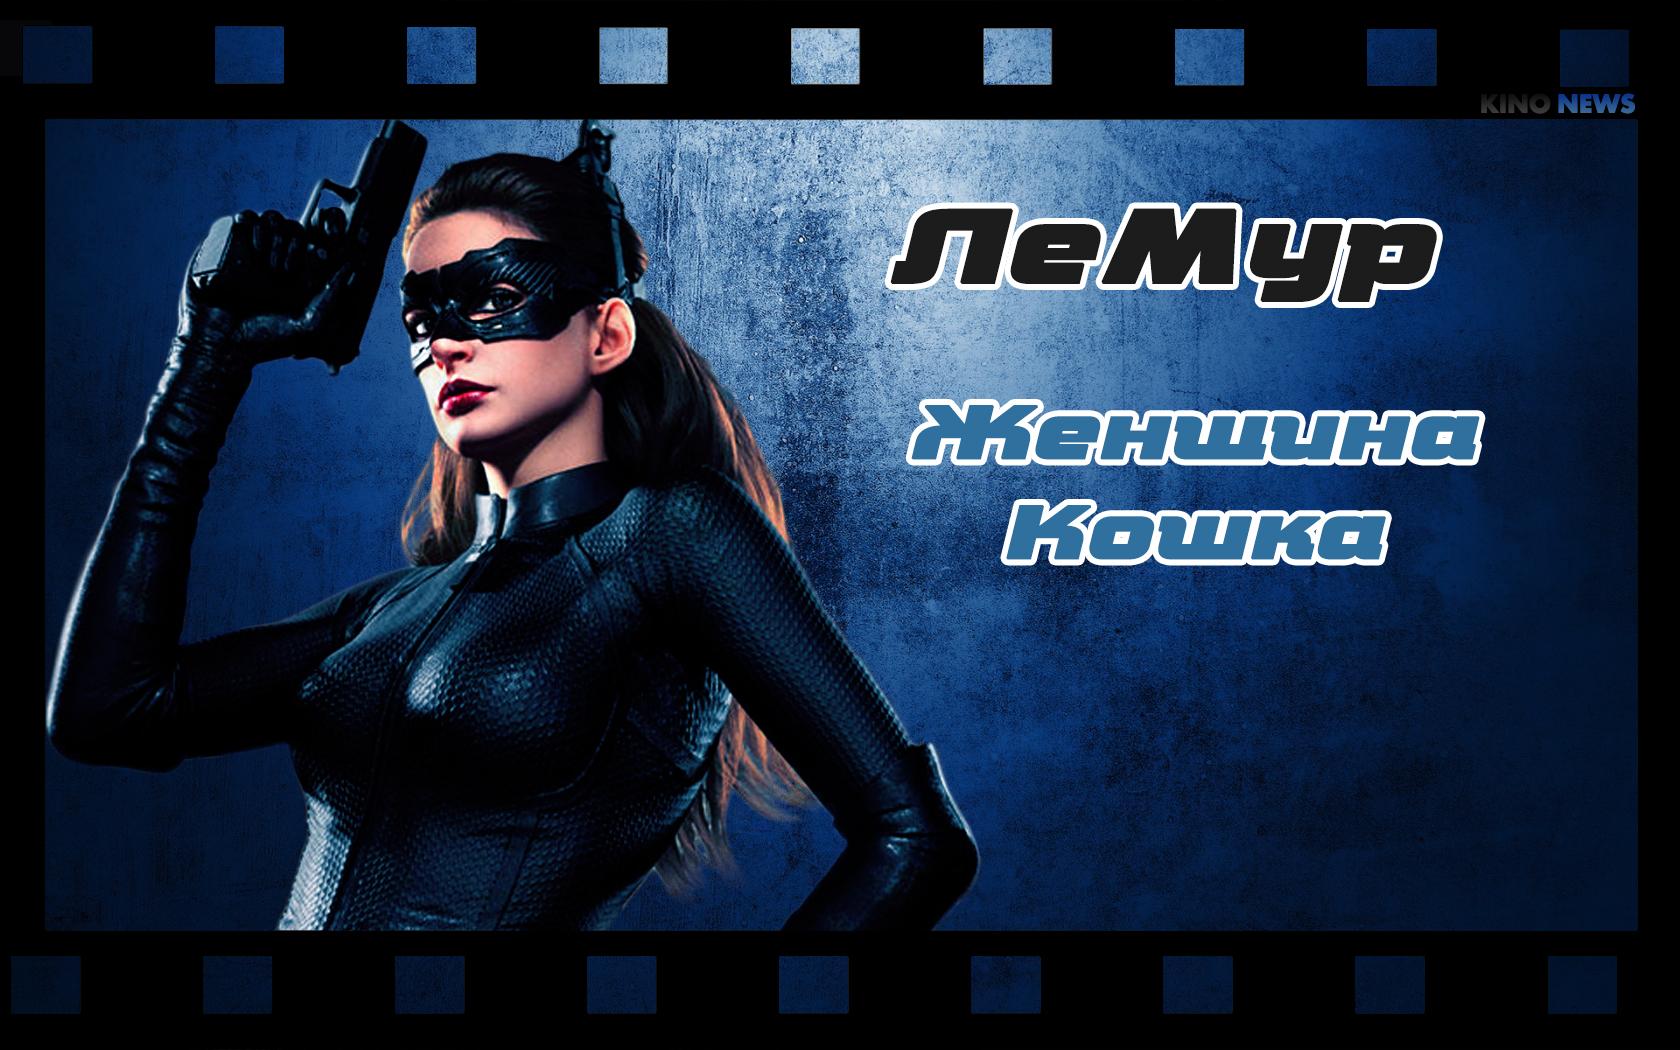 https://www.kinonews.ru/insimgs/2017/persimg/persimg77944_97.jpg